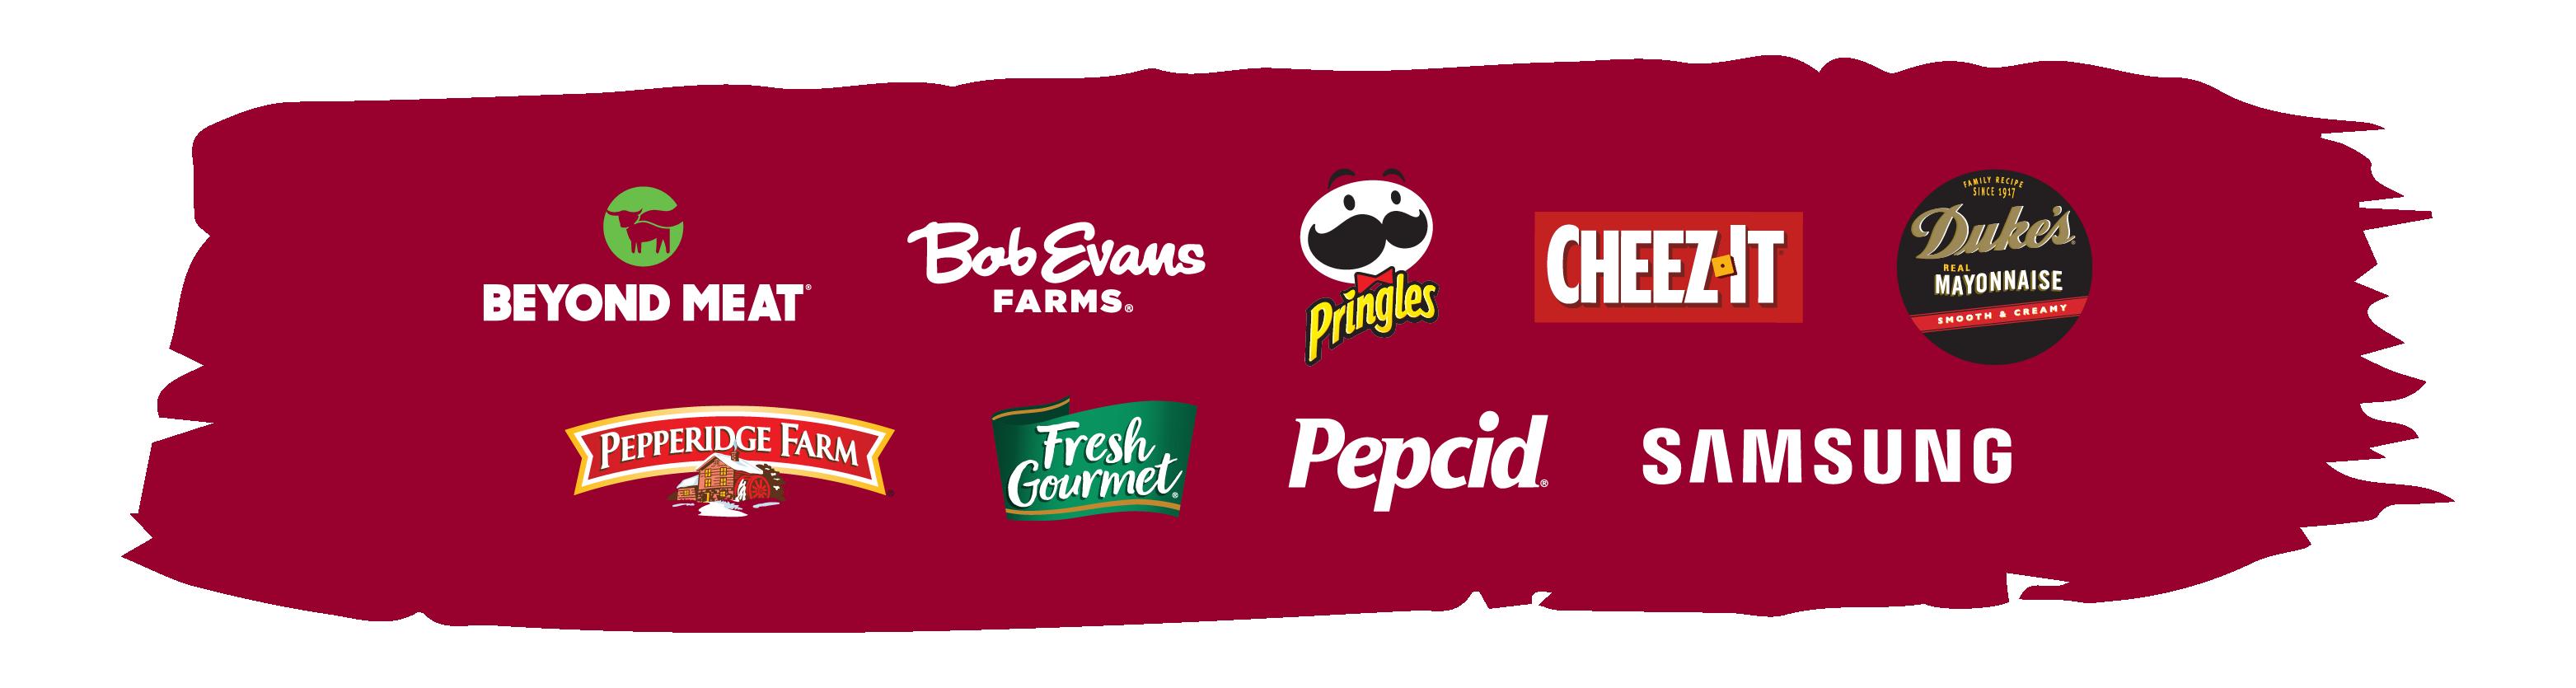 Tailgate Town Partners: Beyond Meat®   Bob Evans Farms®   Pringles®   Cheez-It®   Duke's® Real Mayonnaise   Pepperidge Farm®   Fresh Gourmet®   Pepcid®   Samsung